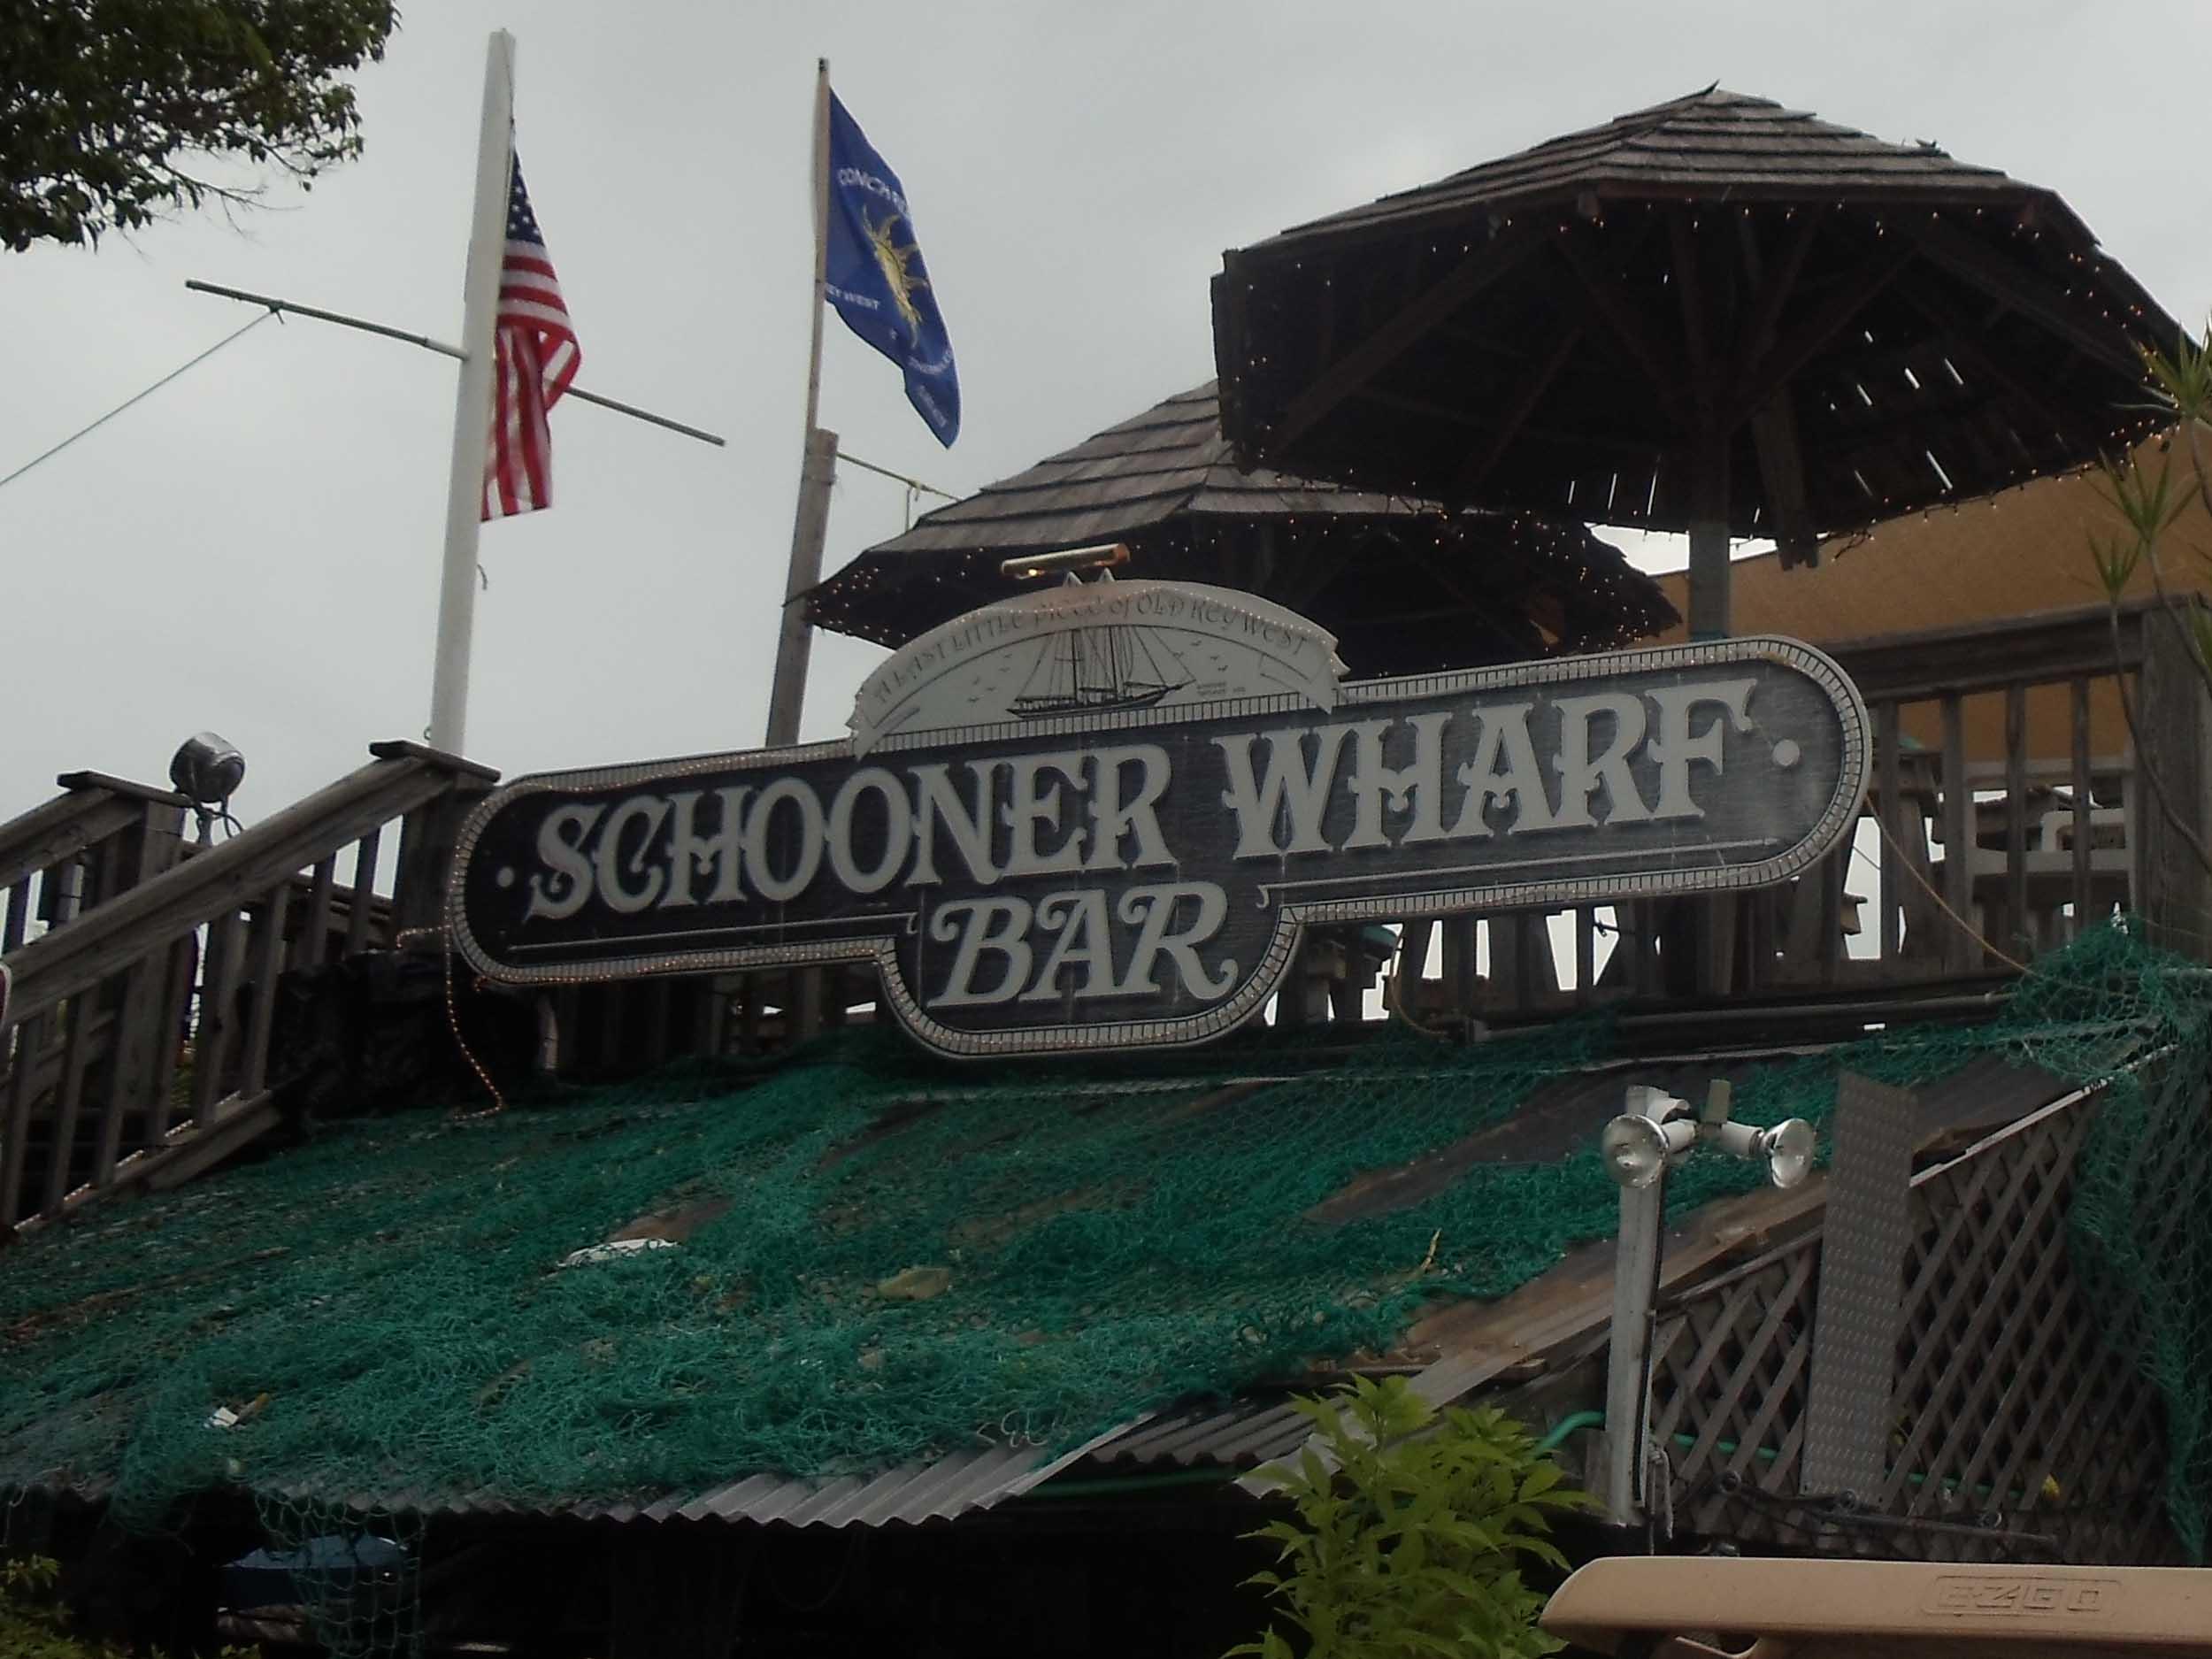 Schooner Wharf Bar Sign